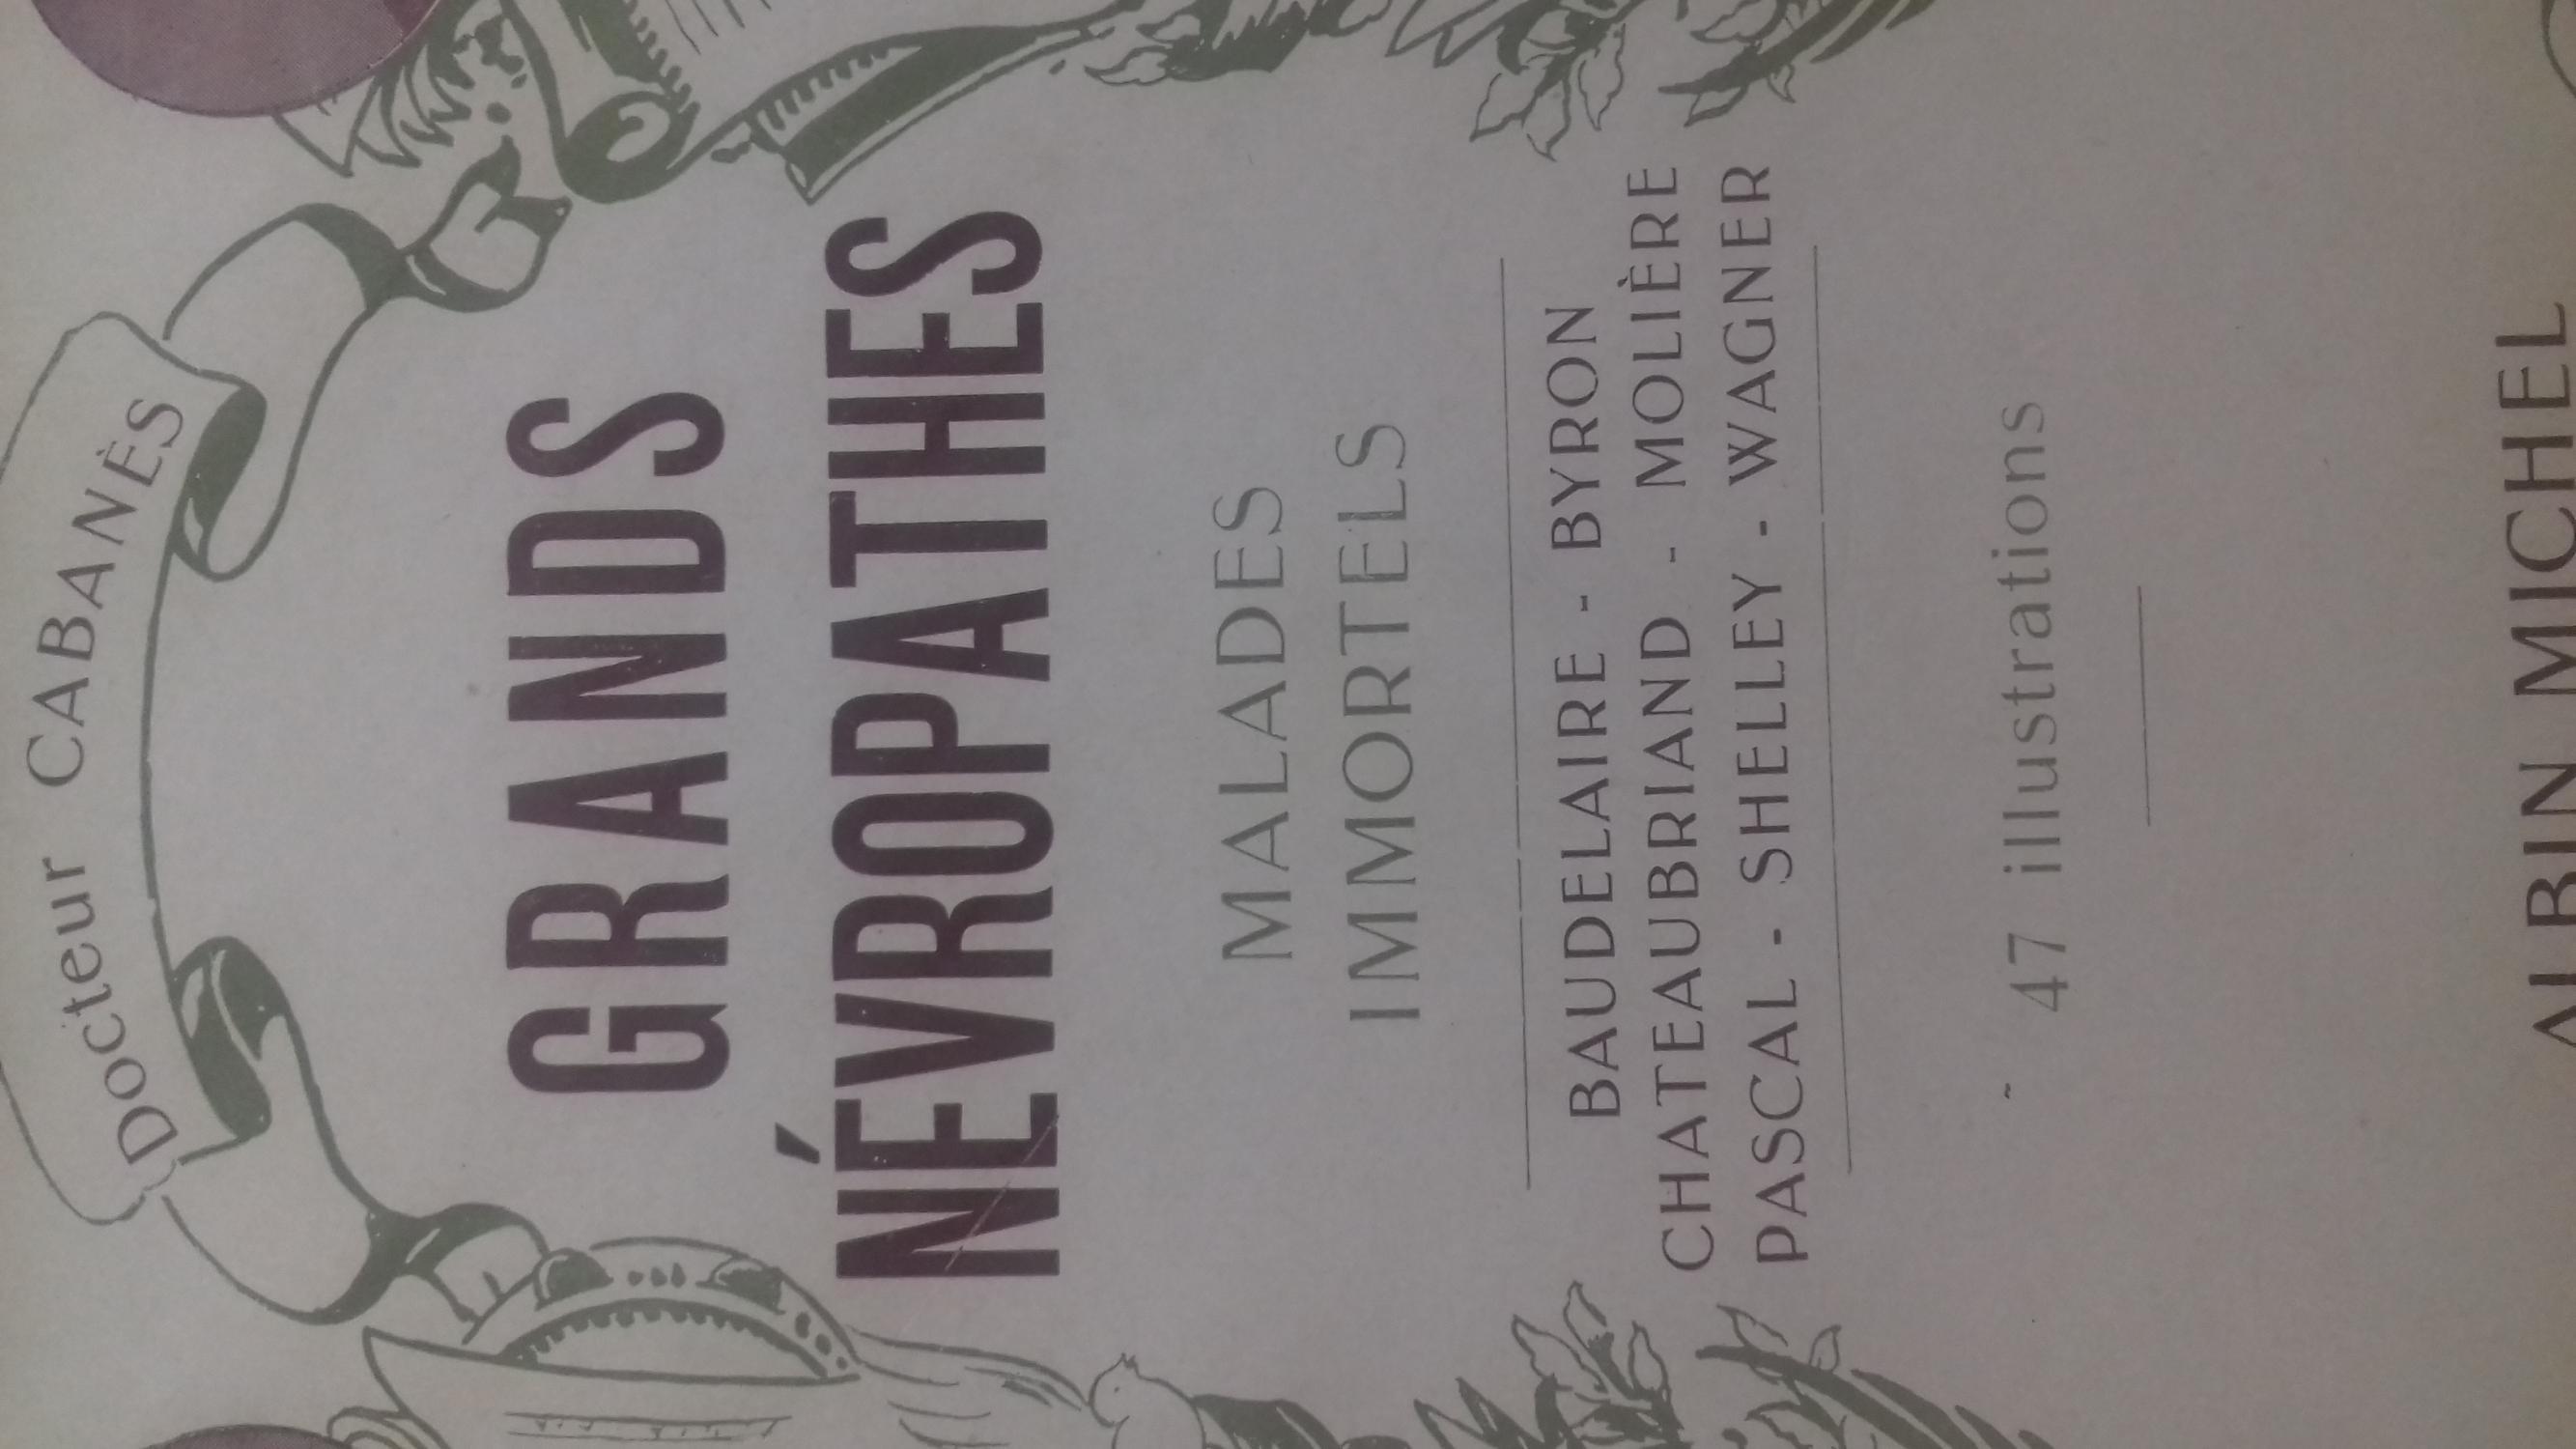 Grands nevropathes, 3 tomes docteur cabanes